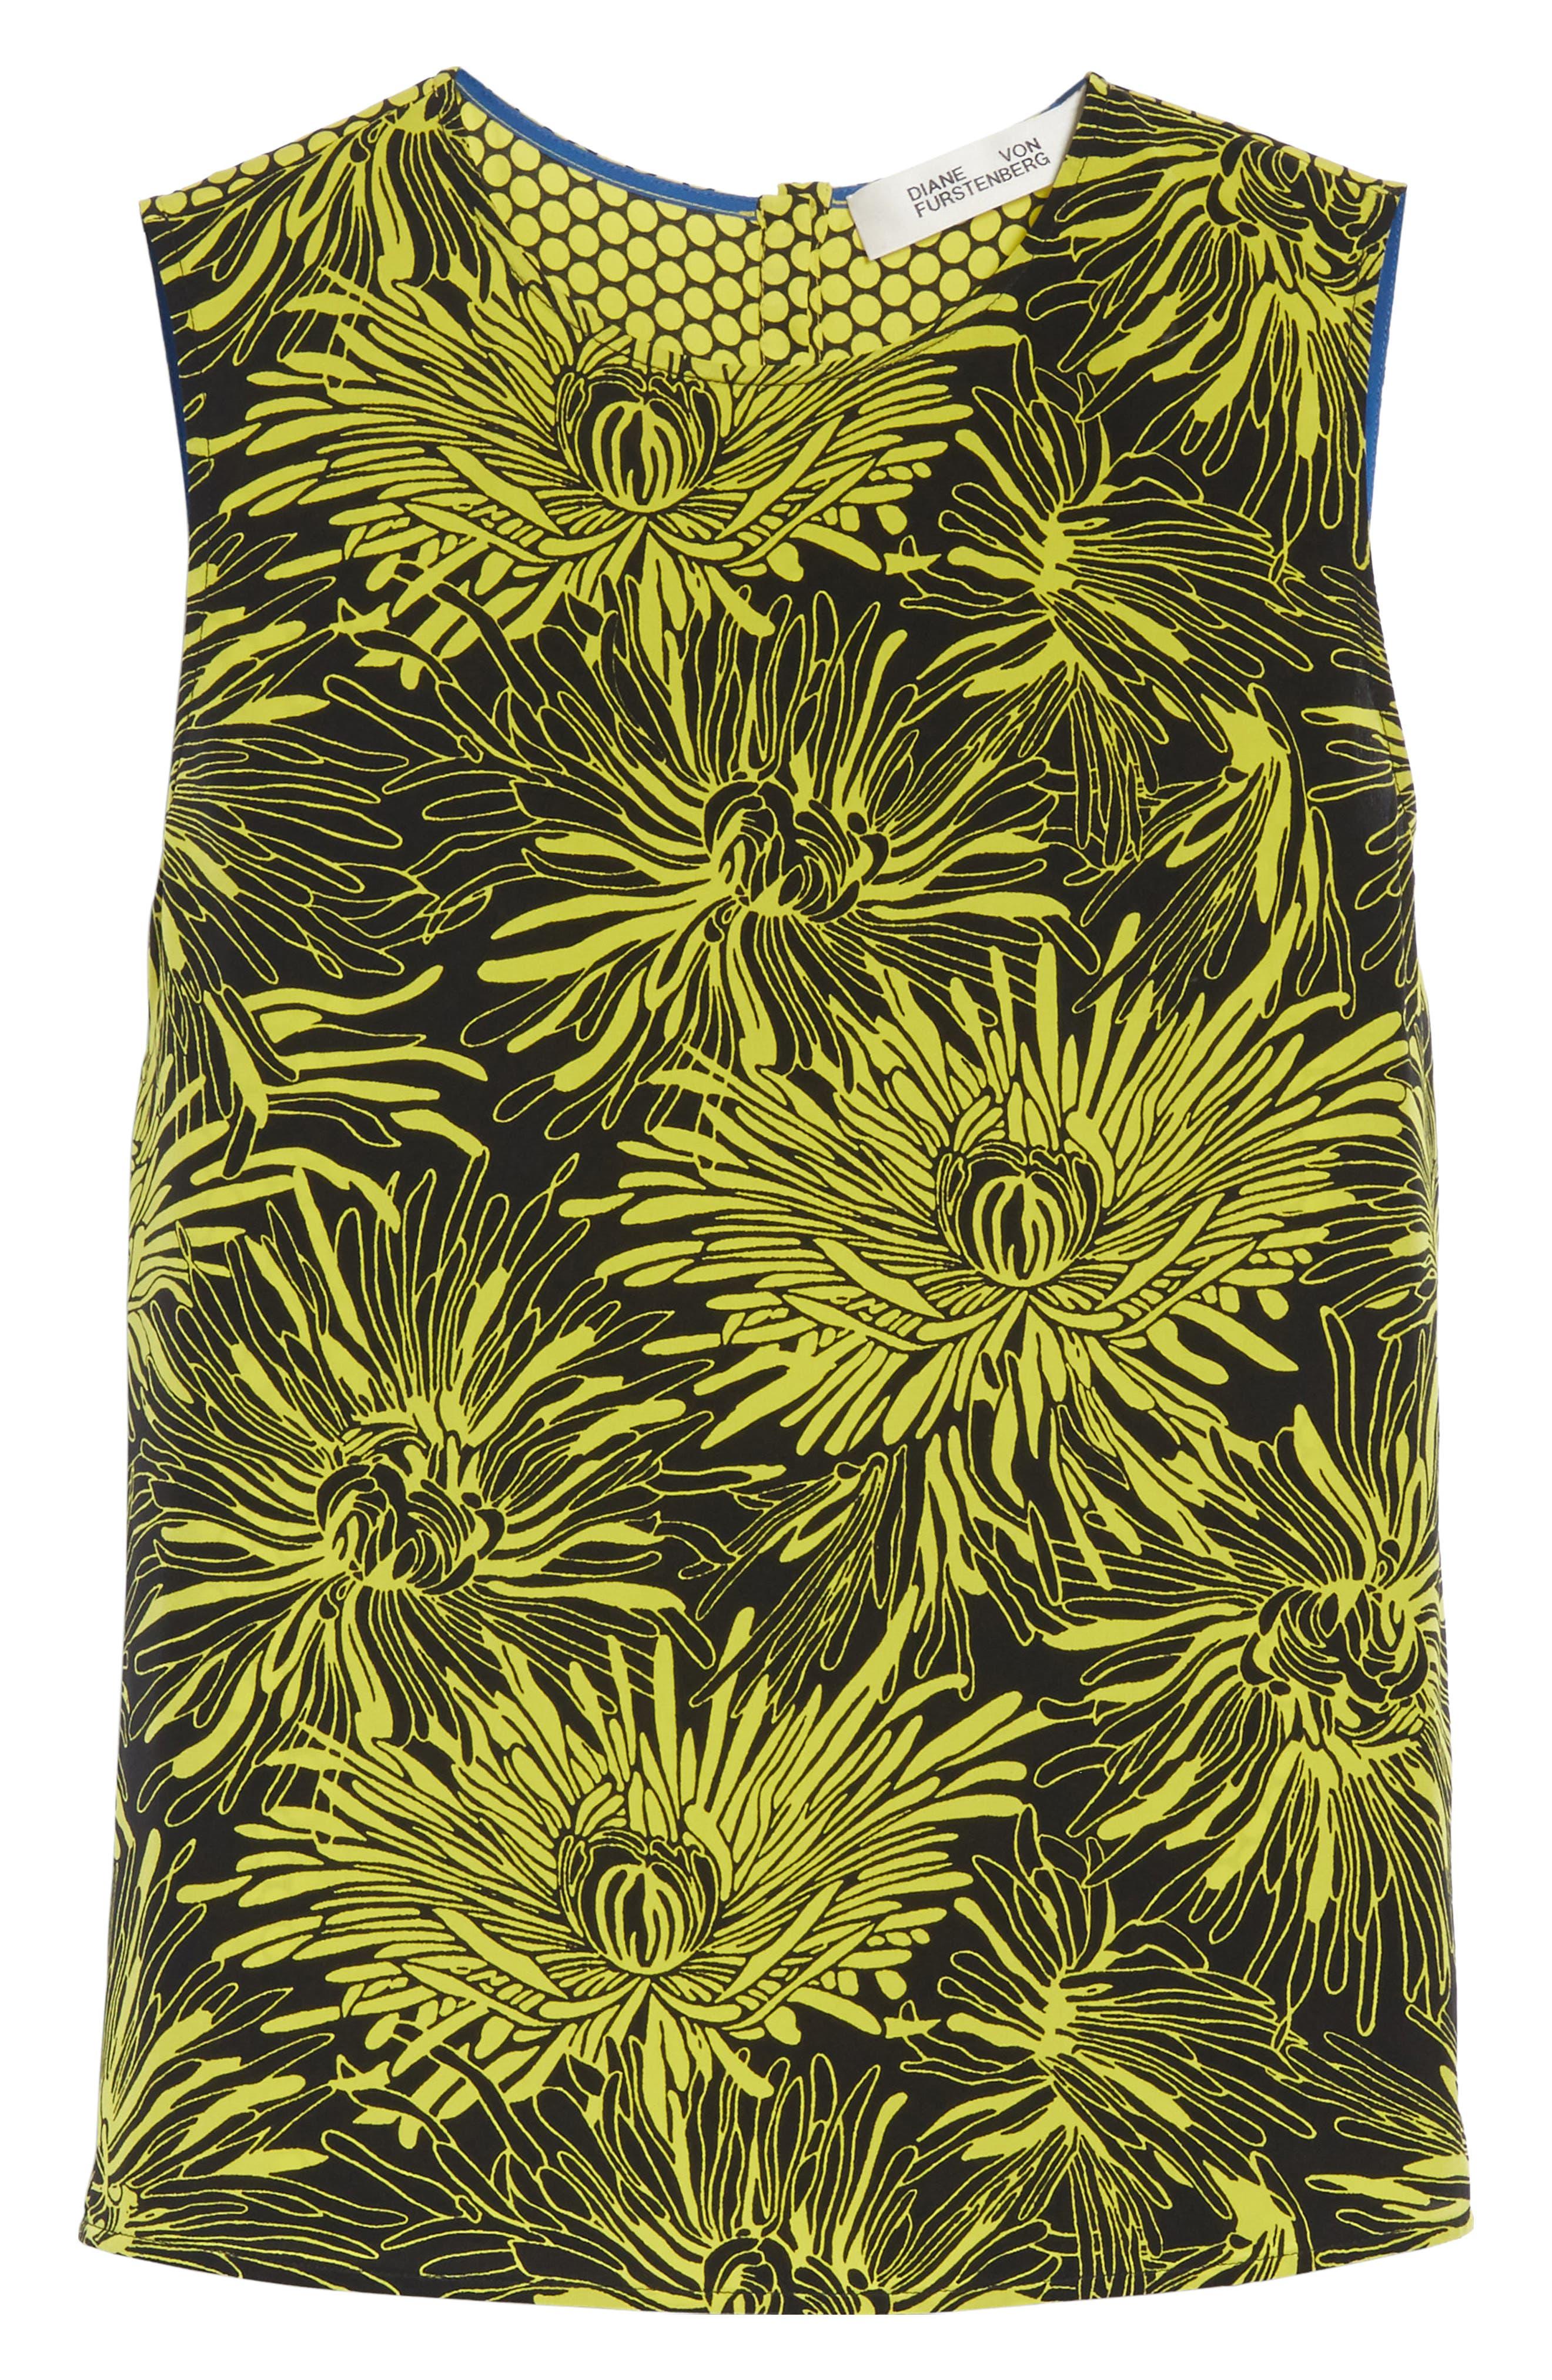 Diane von Furstenberg Floral Print Silk Shell,                             Alternate thumbnail 6, color,                             WORSLEY CITRON/ ROWE DOT